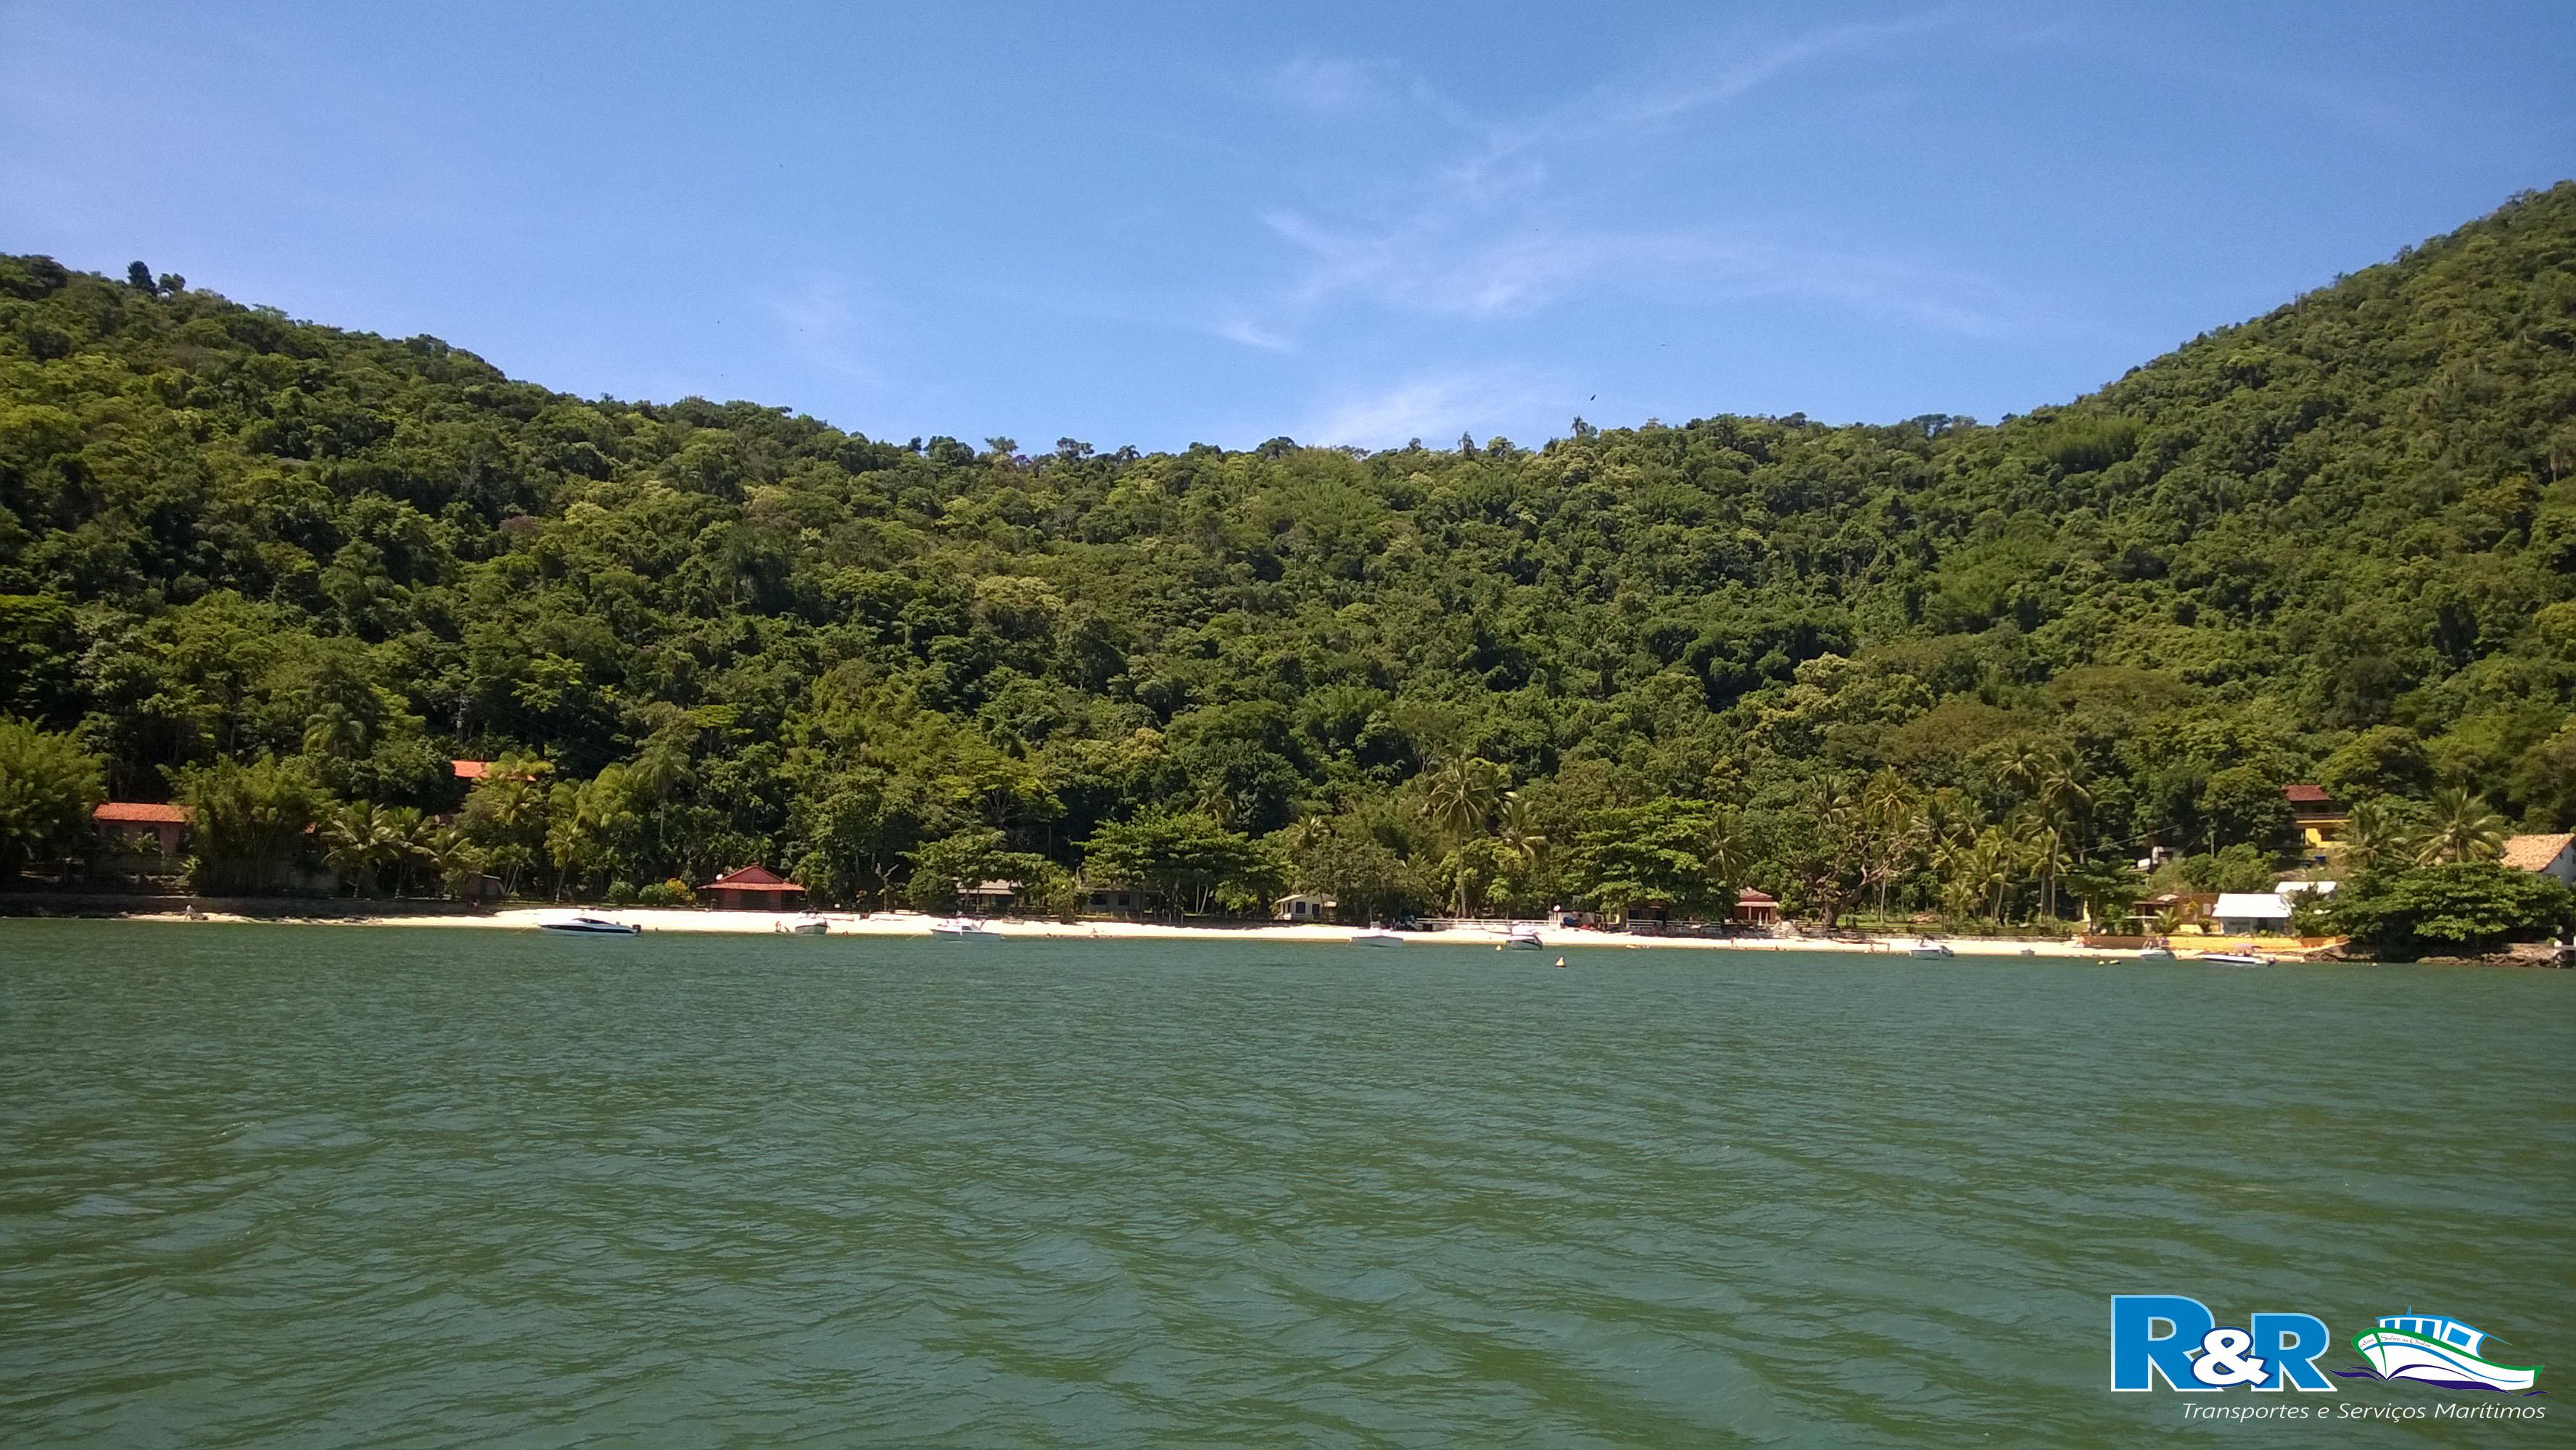 Ilha de Jaguanum - Praia da Estopa - Itacuruçá